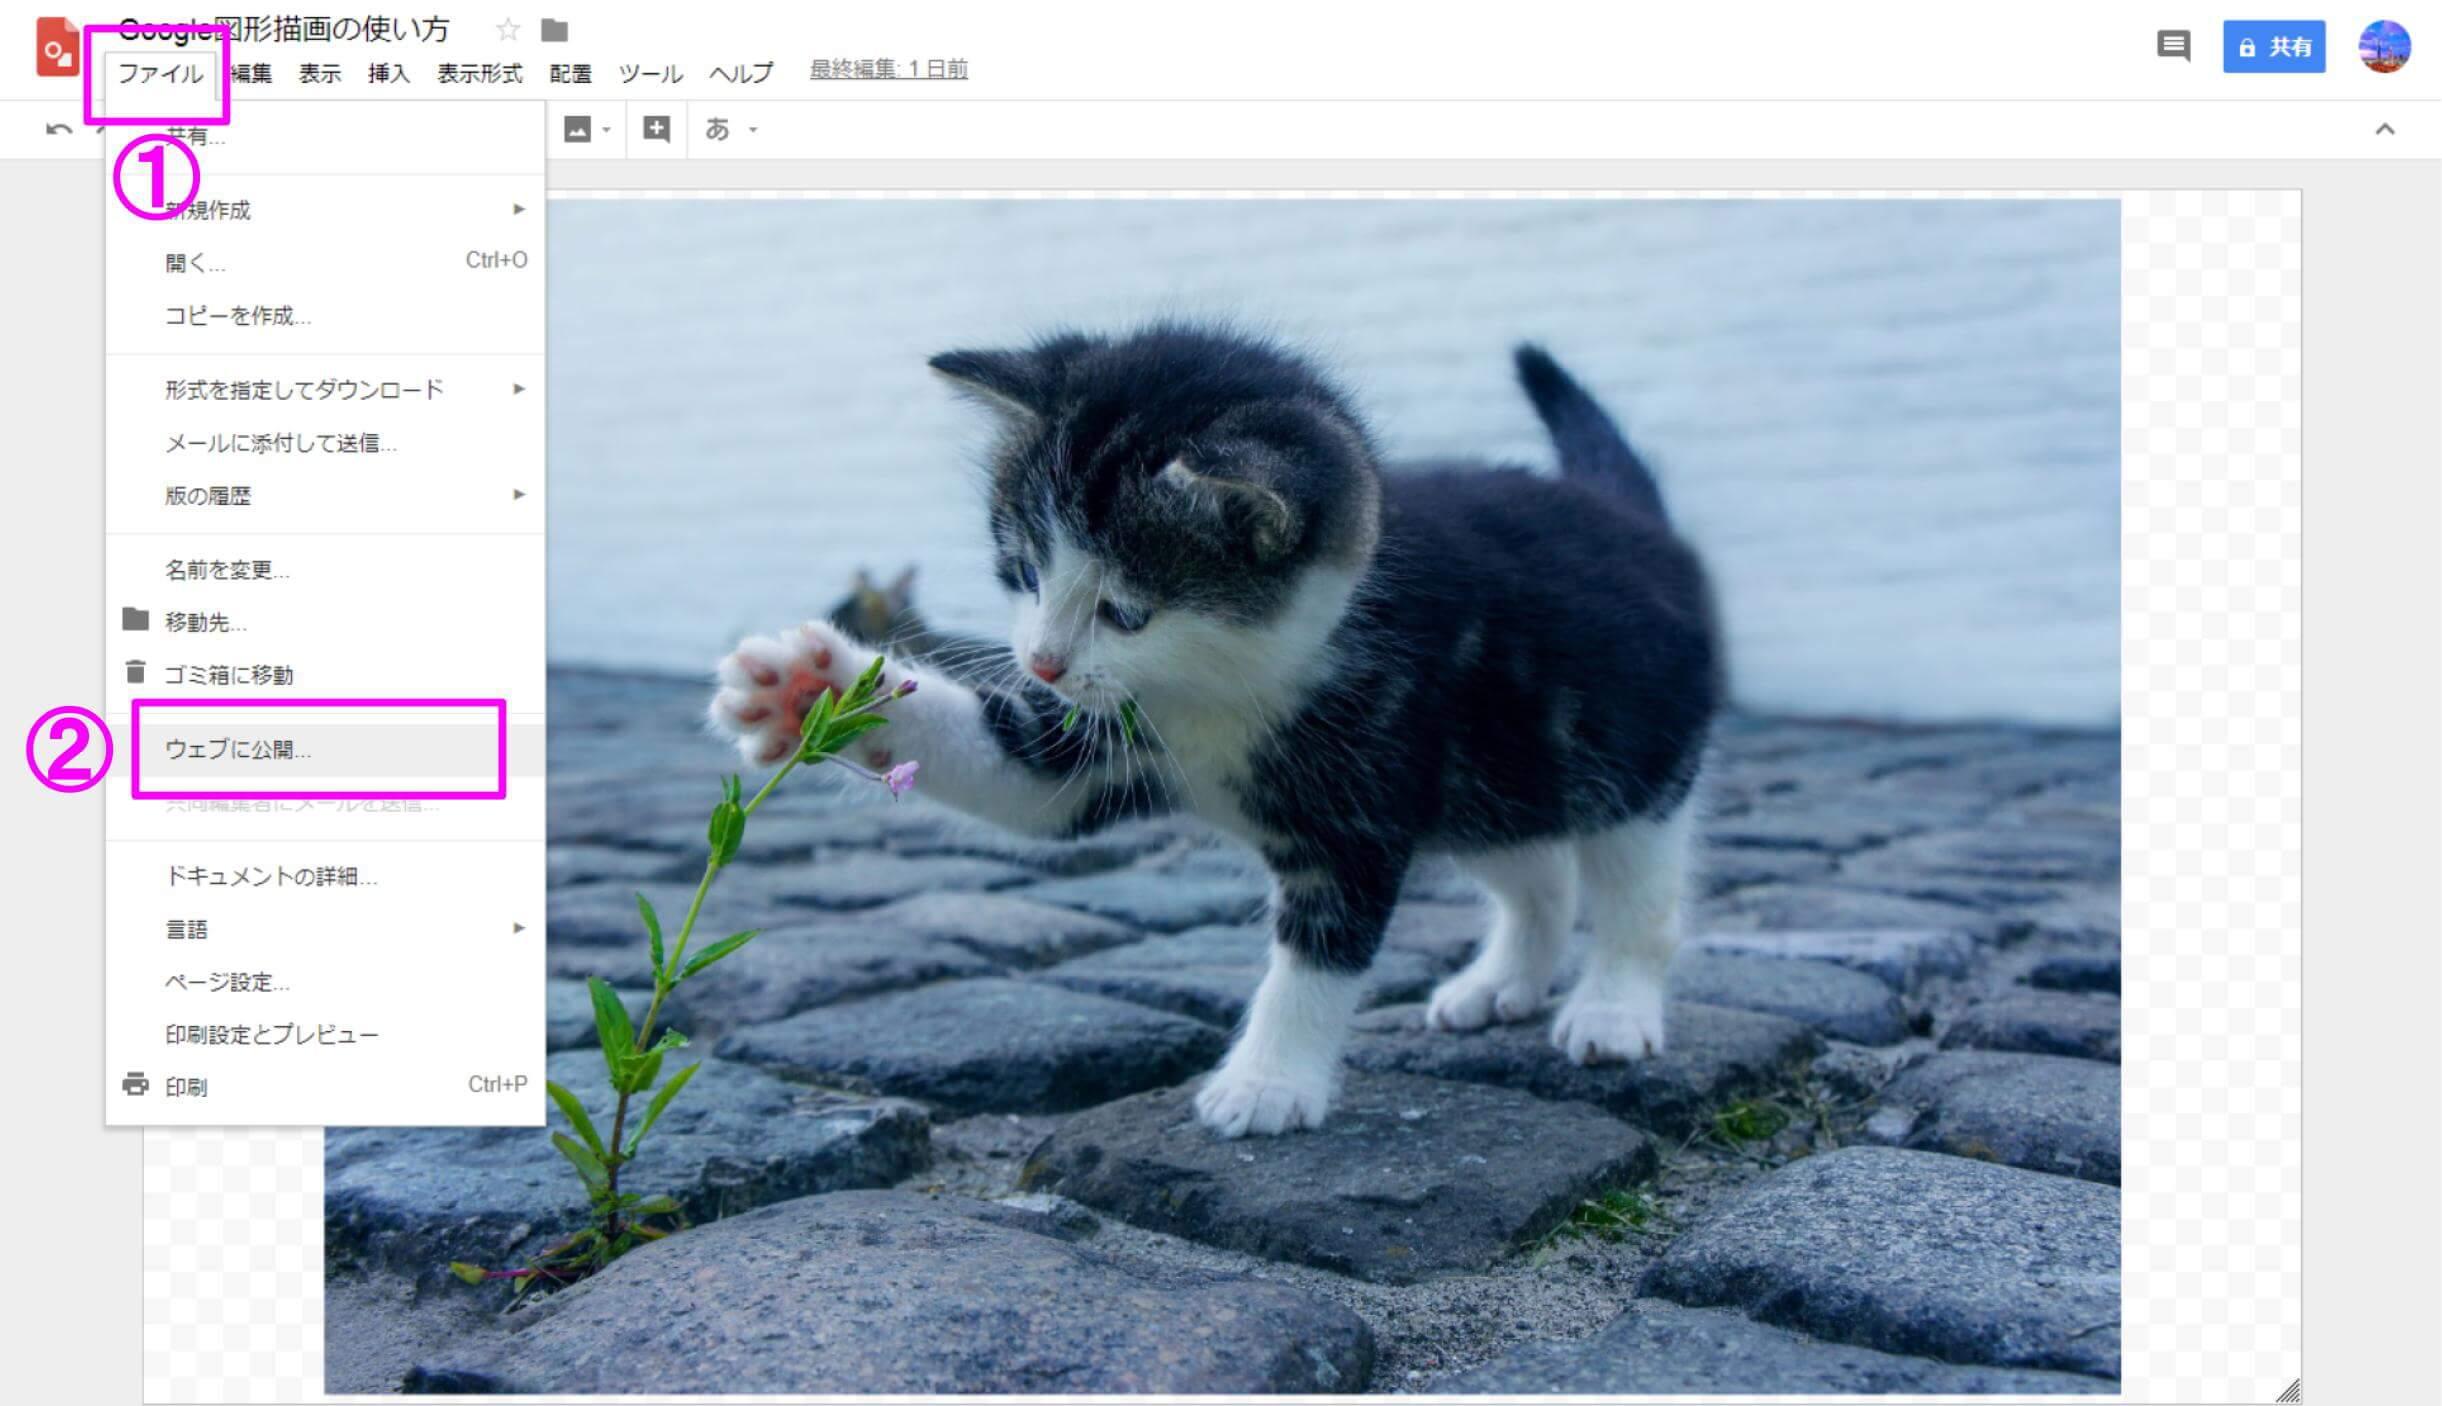 Google図形描画の使い方 ファイル→ウェブに公開